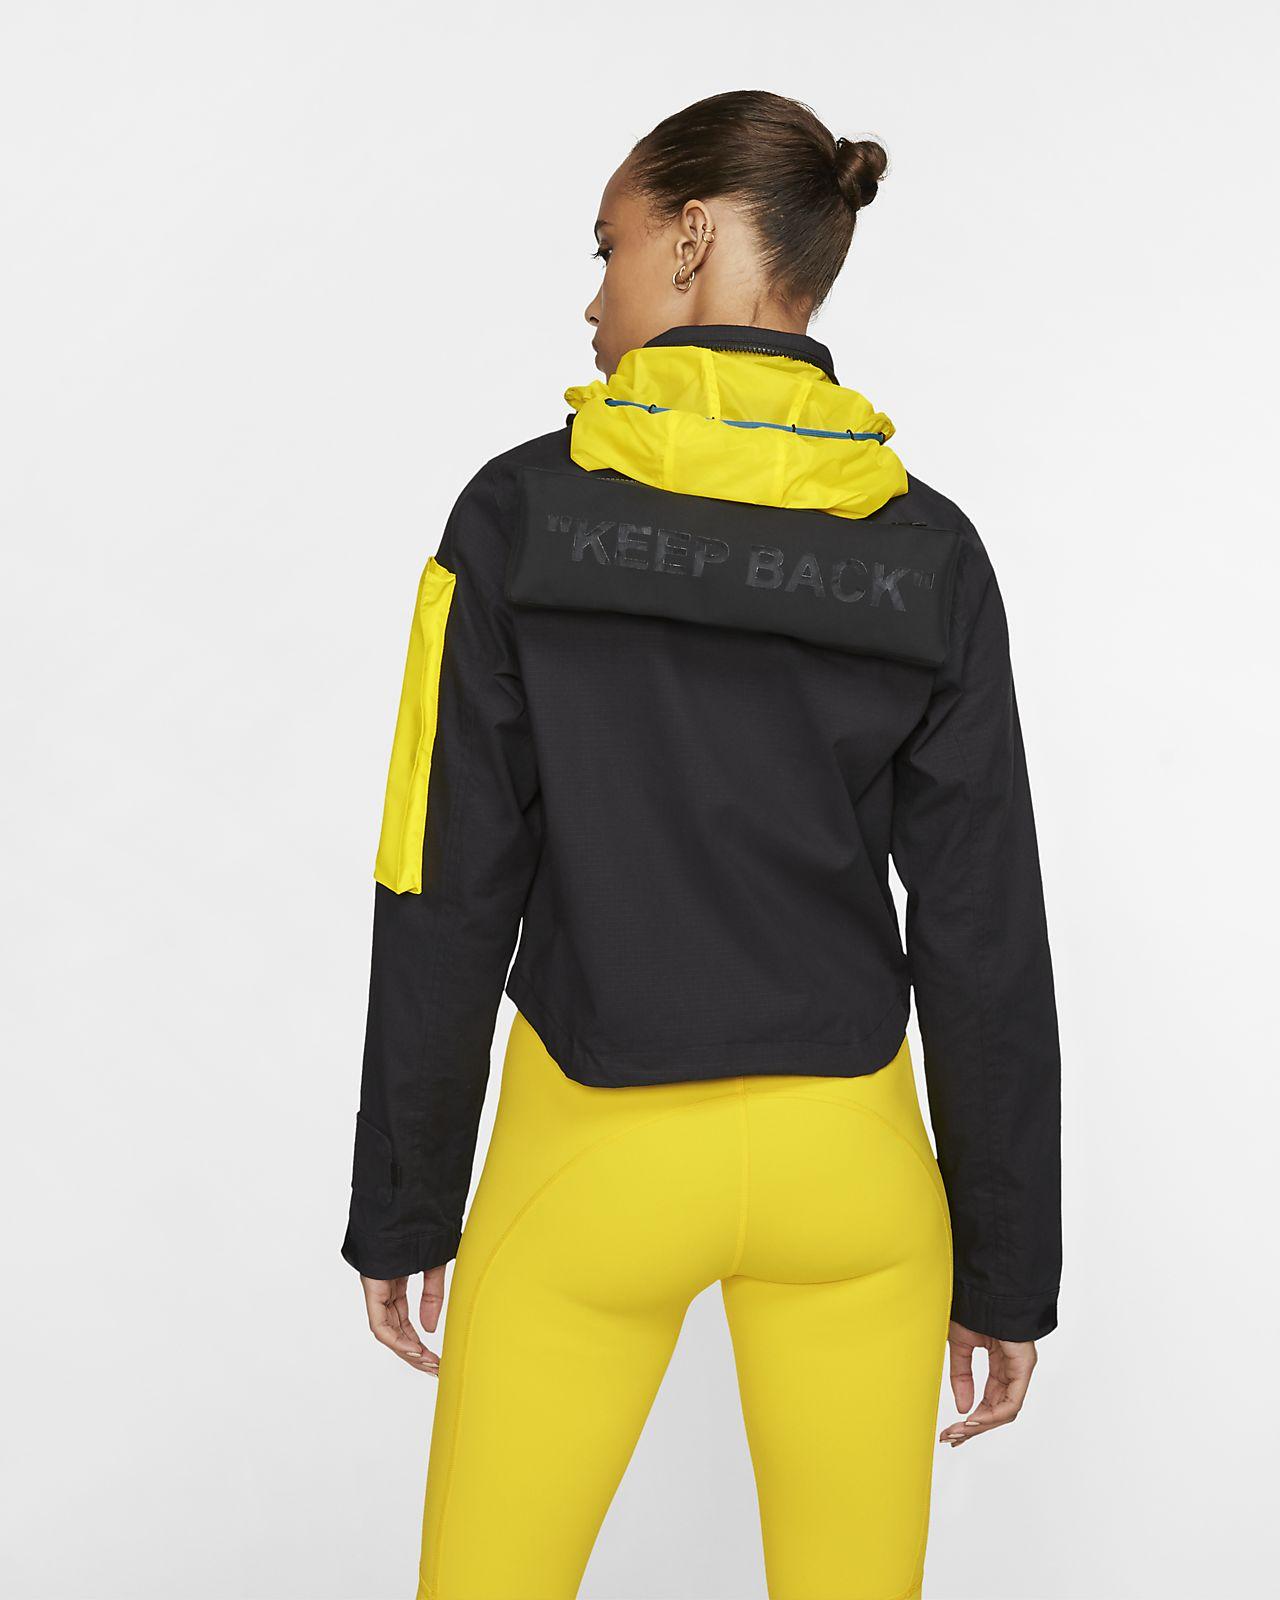 Nike x Off White Women's Running Jacket